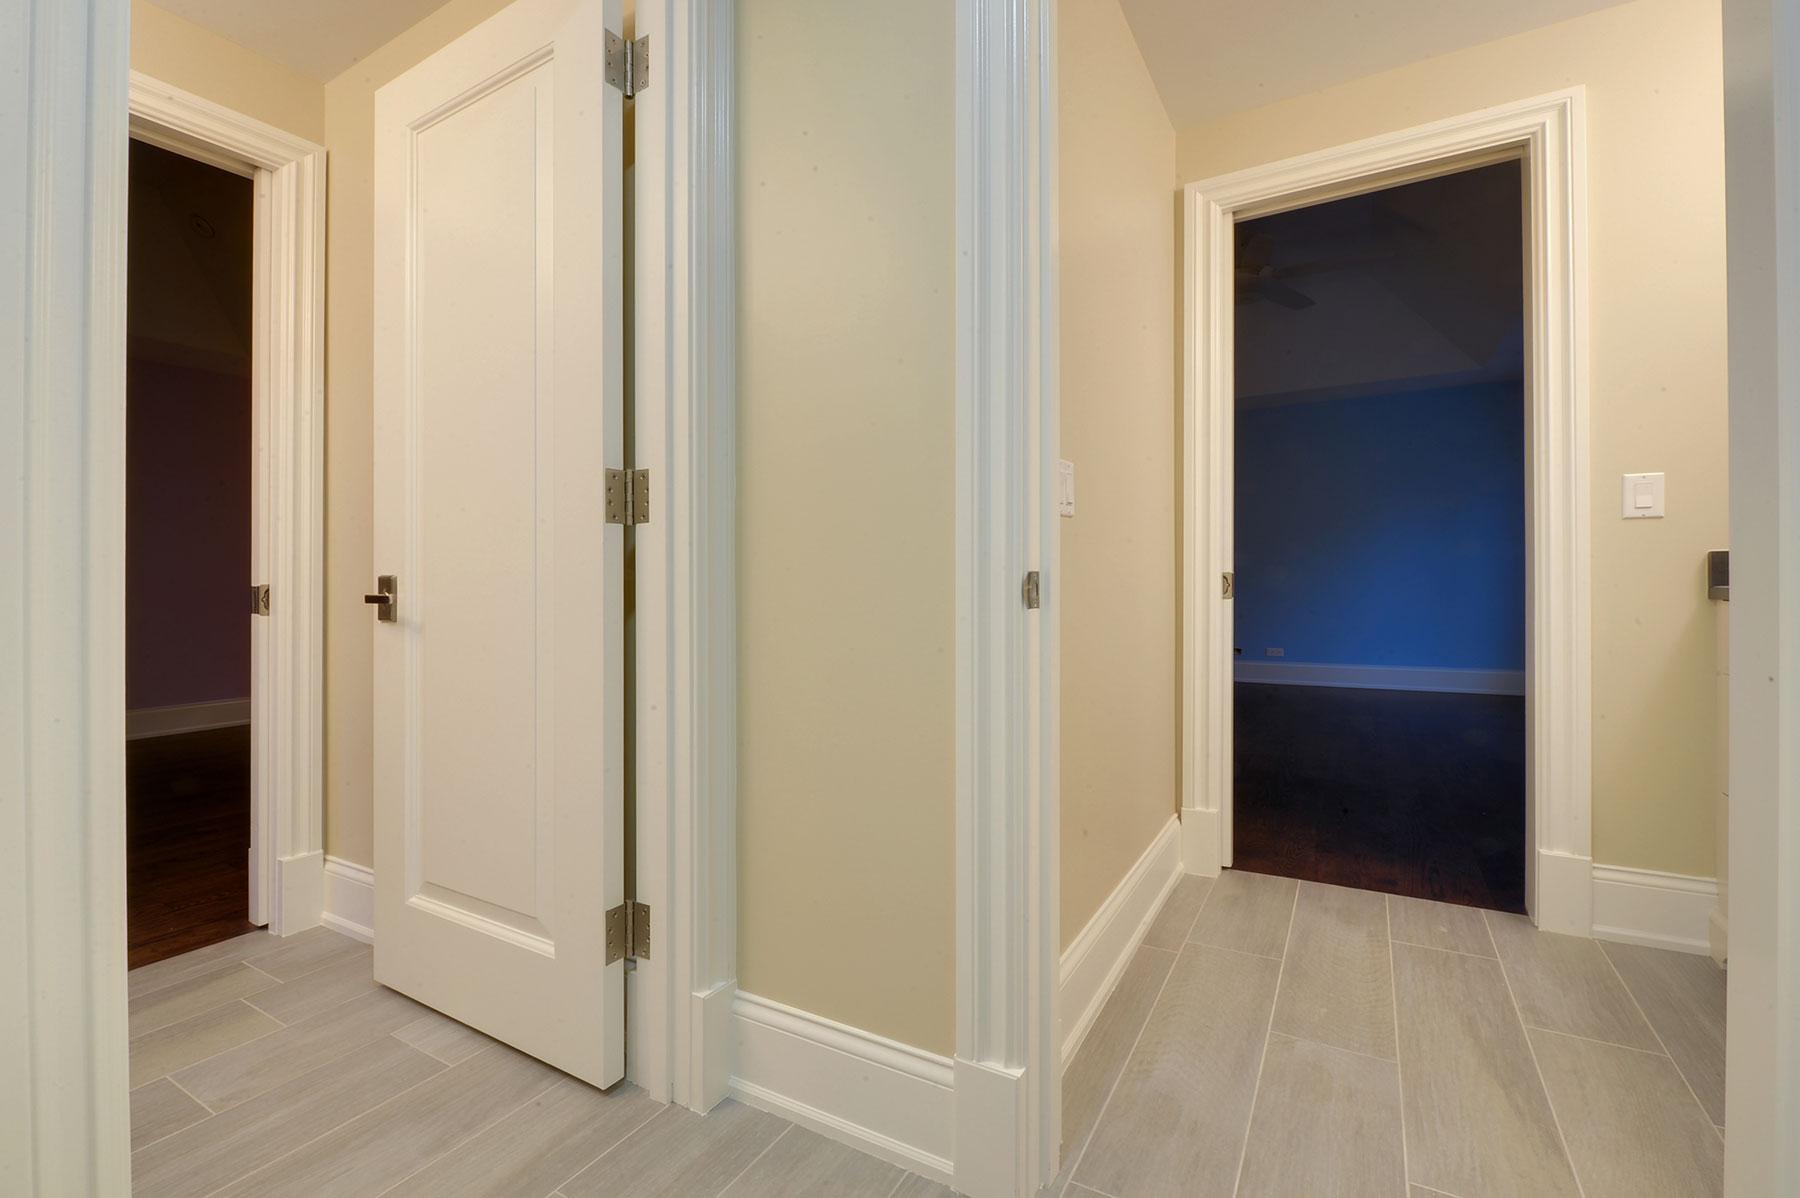 custom interior door single raised panel white painted wood entry